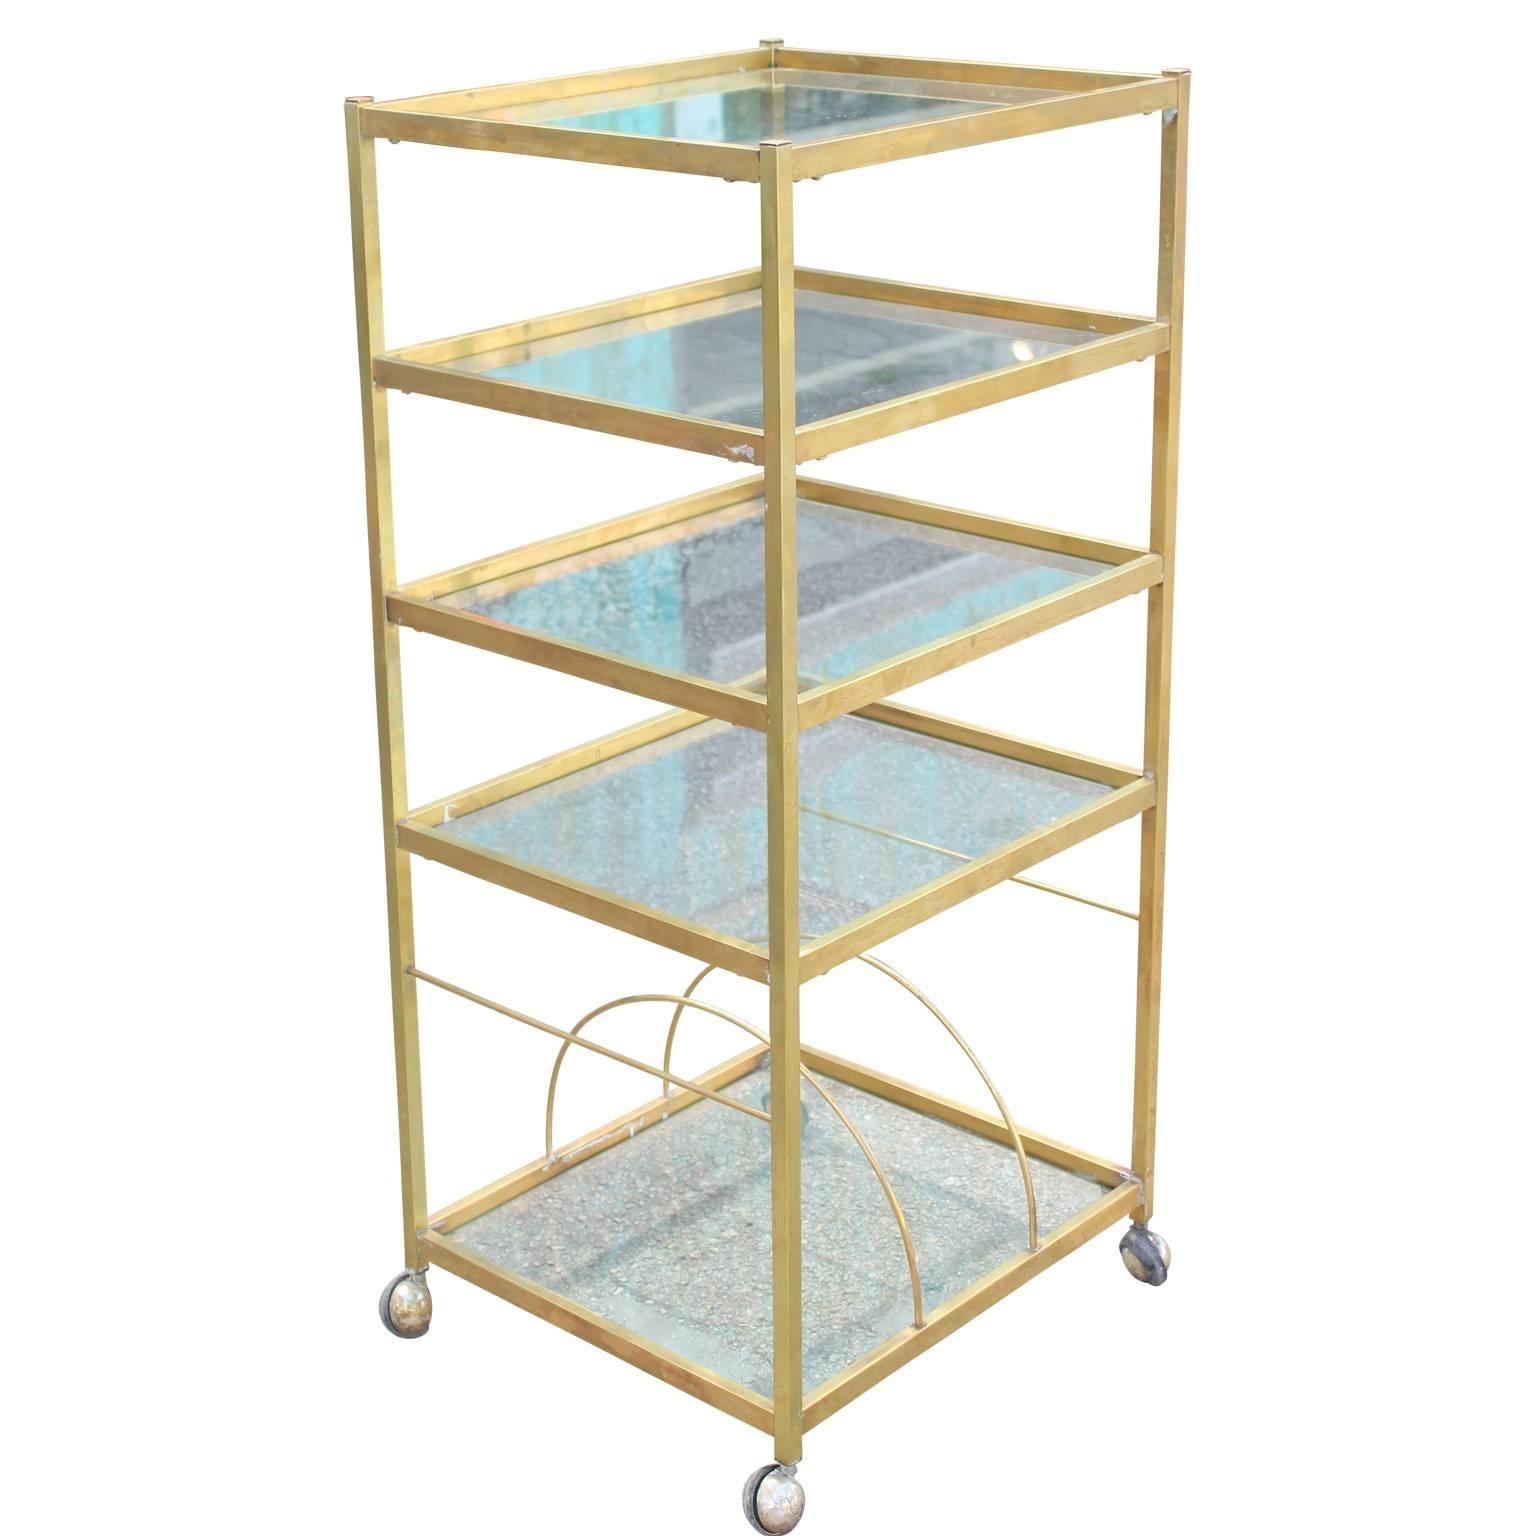 Modern Brass Bar Cart or Display with Glass Shelves